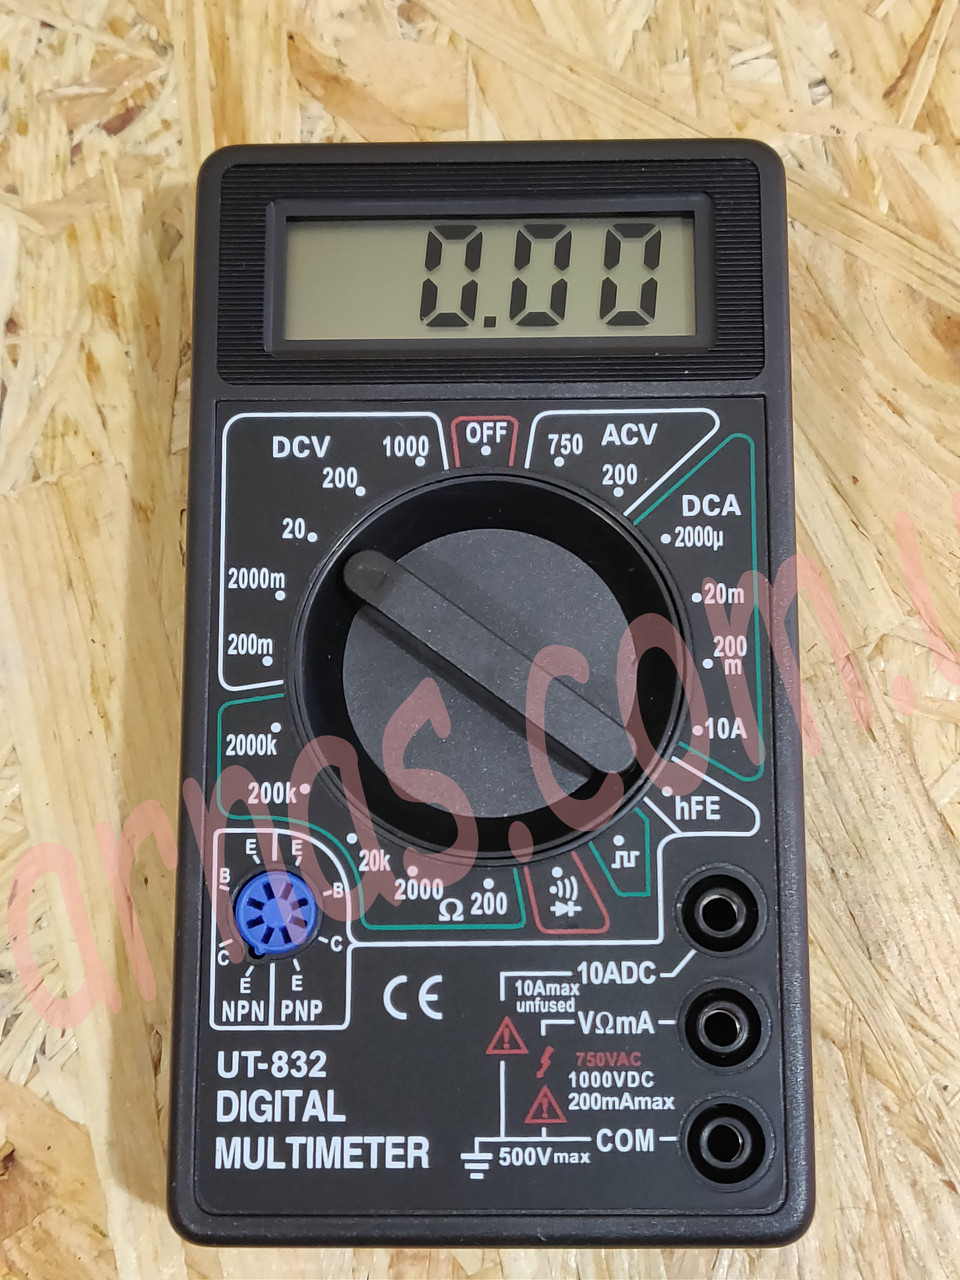 Мультиметр (тестер) UT-832 цифровой